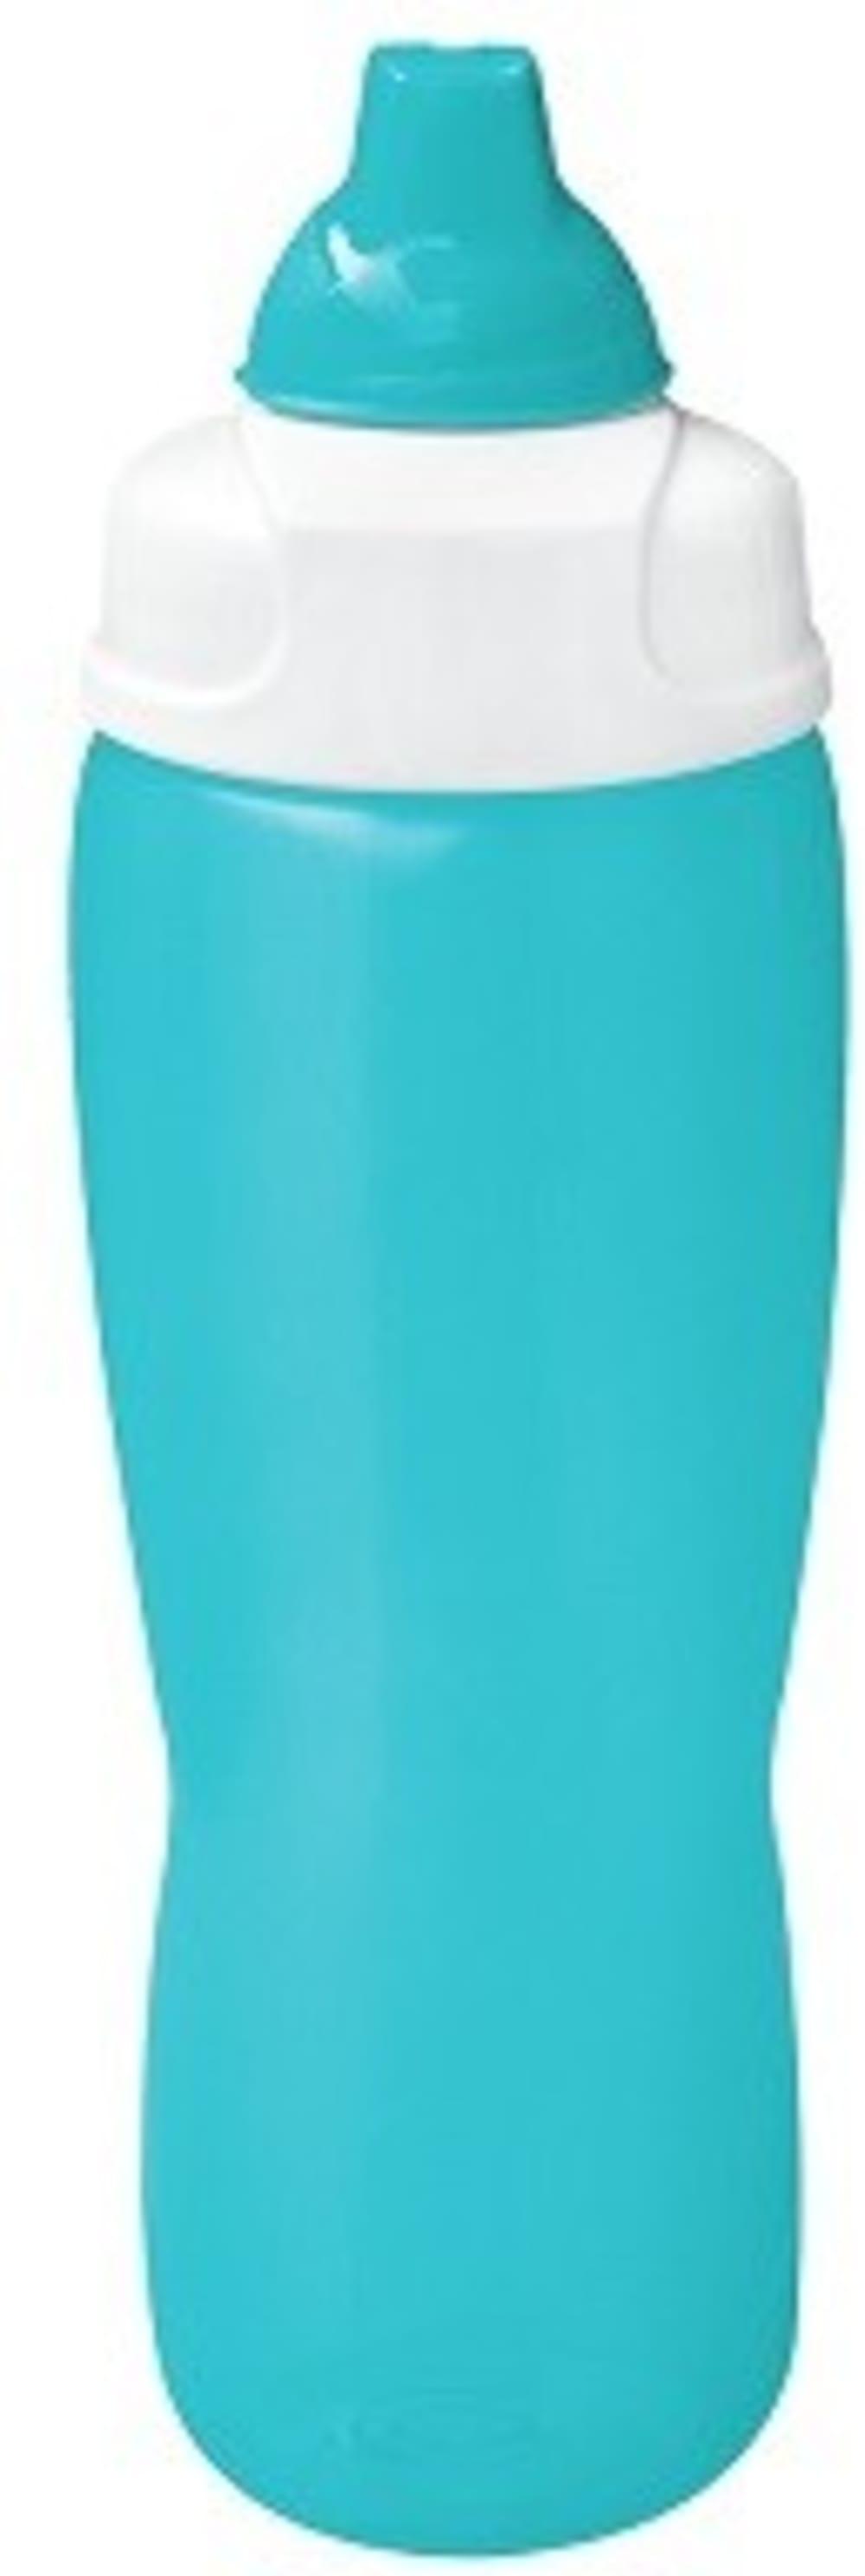 Butelka na napoje niebieska SQUEEZE ZAK! 810ml